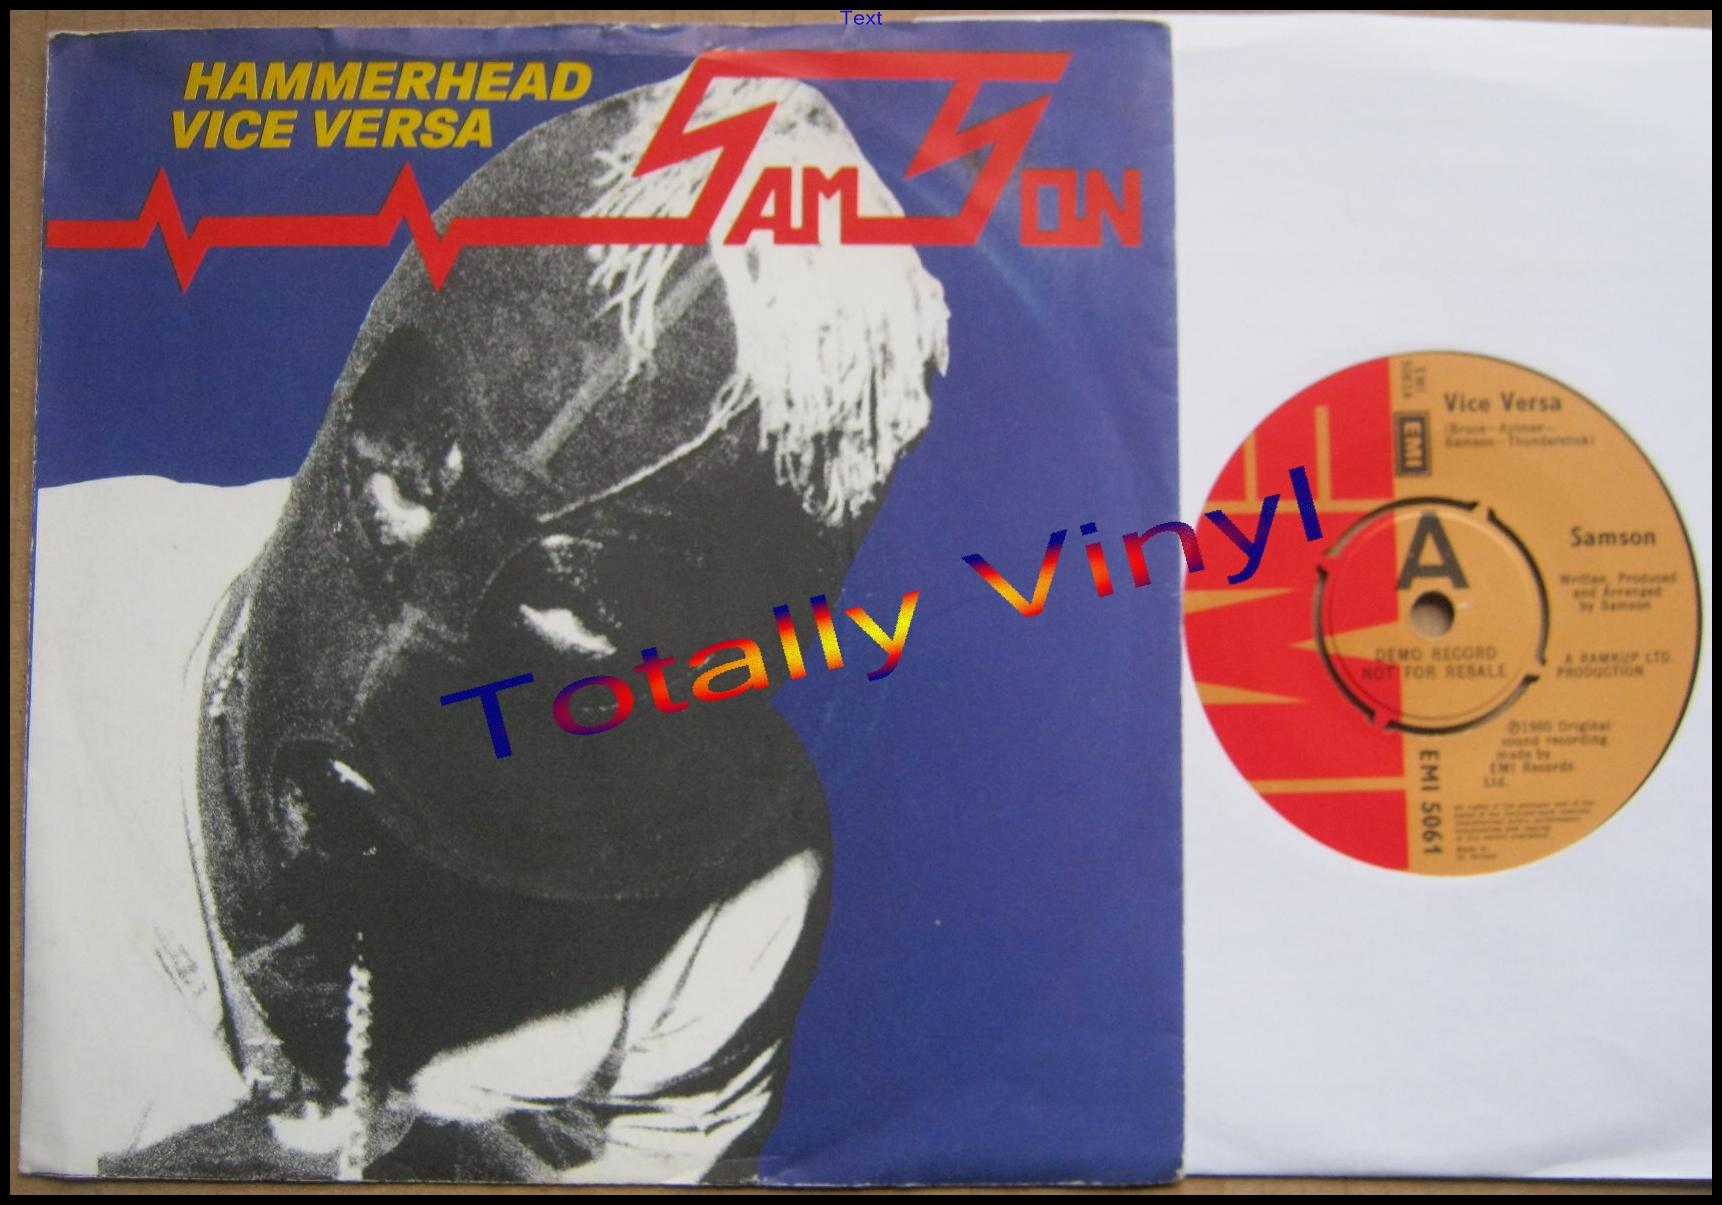 Totally Vinyl Records Samson Hammerhead Vice Versa 7